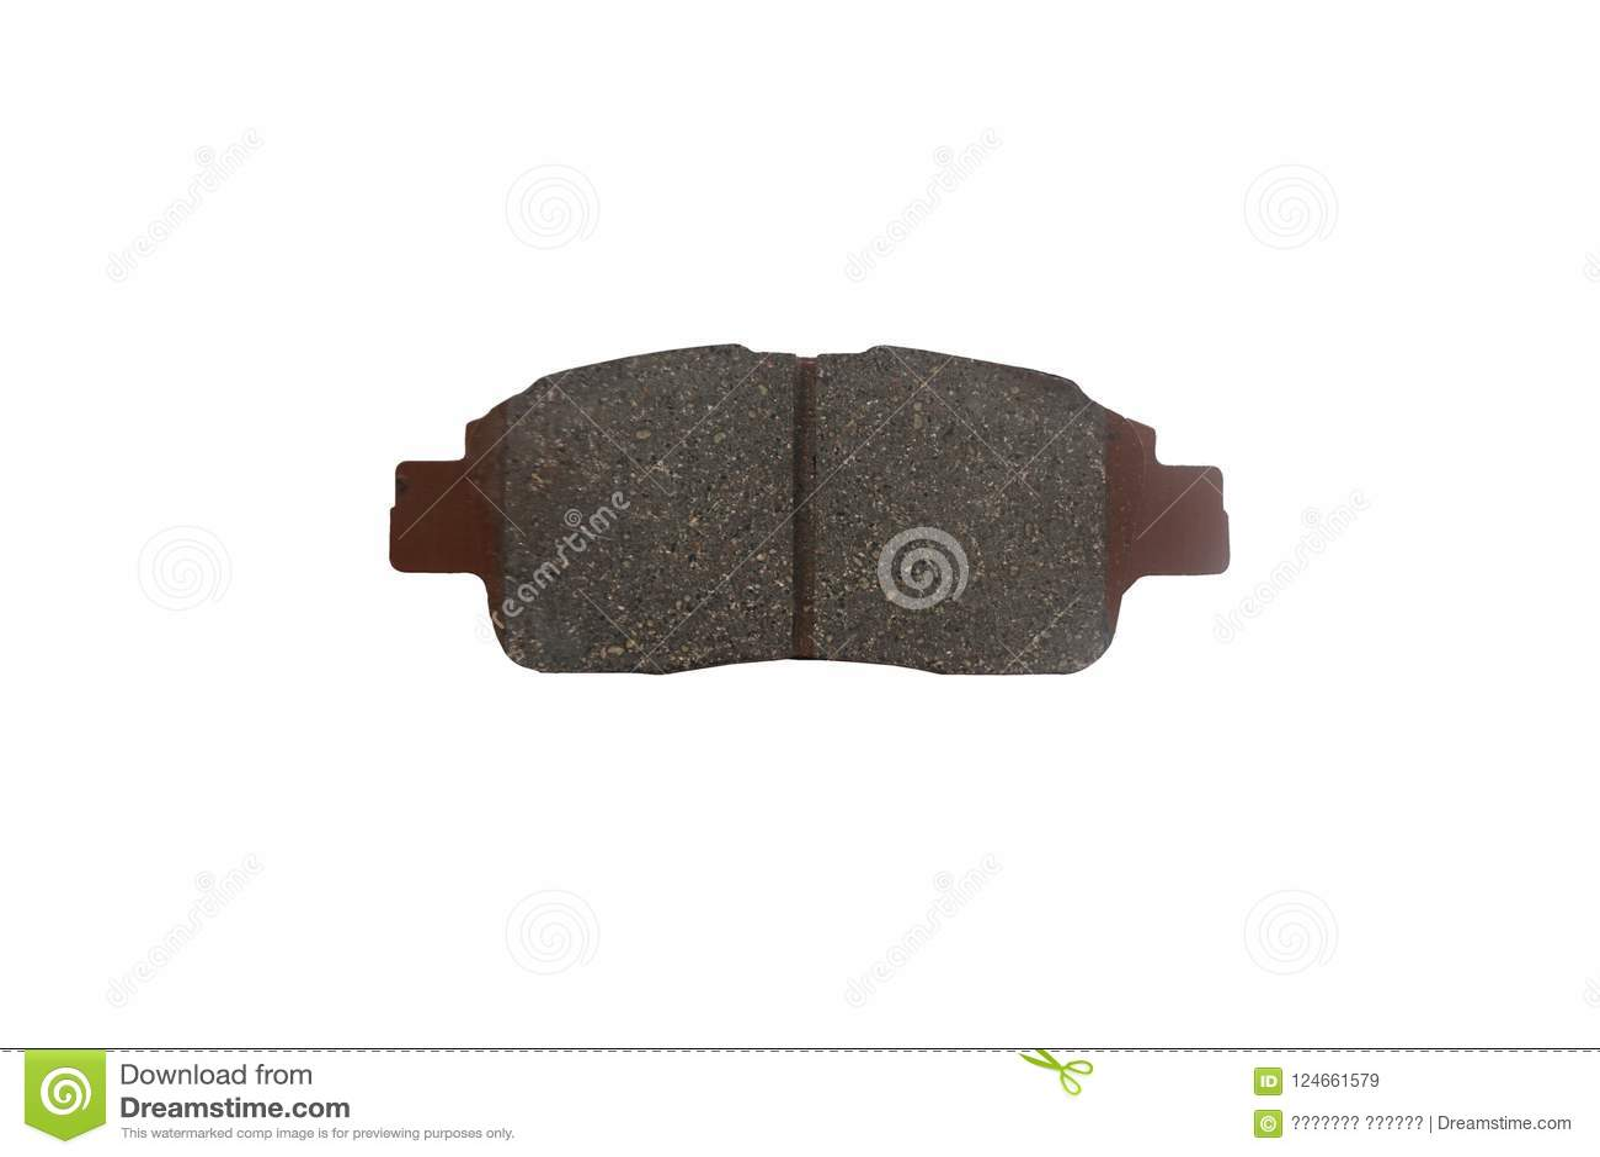 New auto brake pad isolated on white background